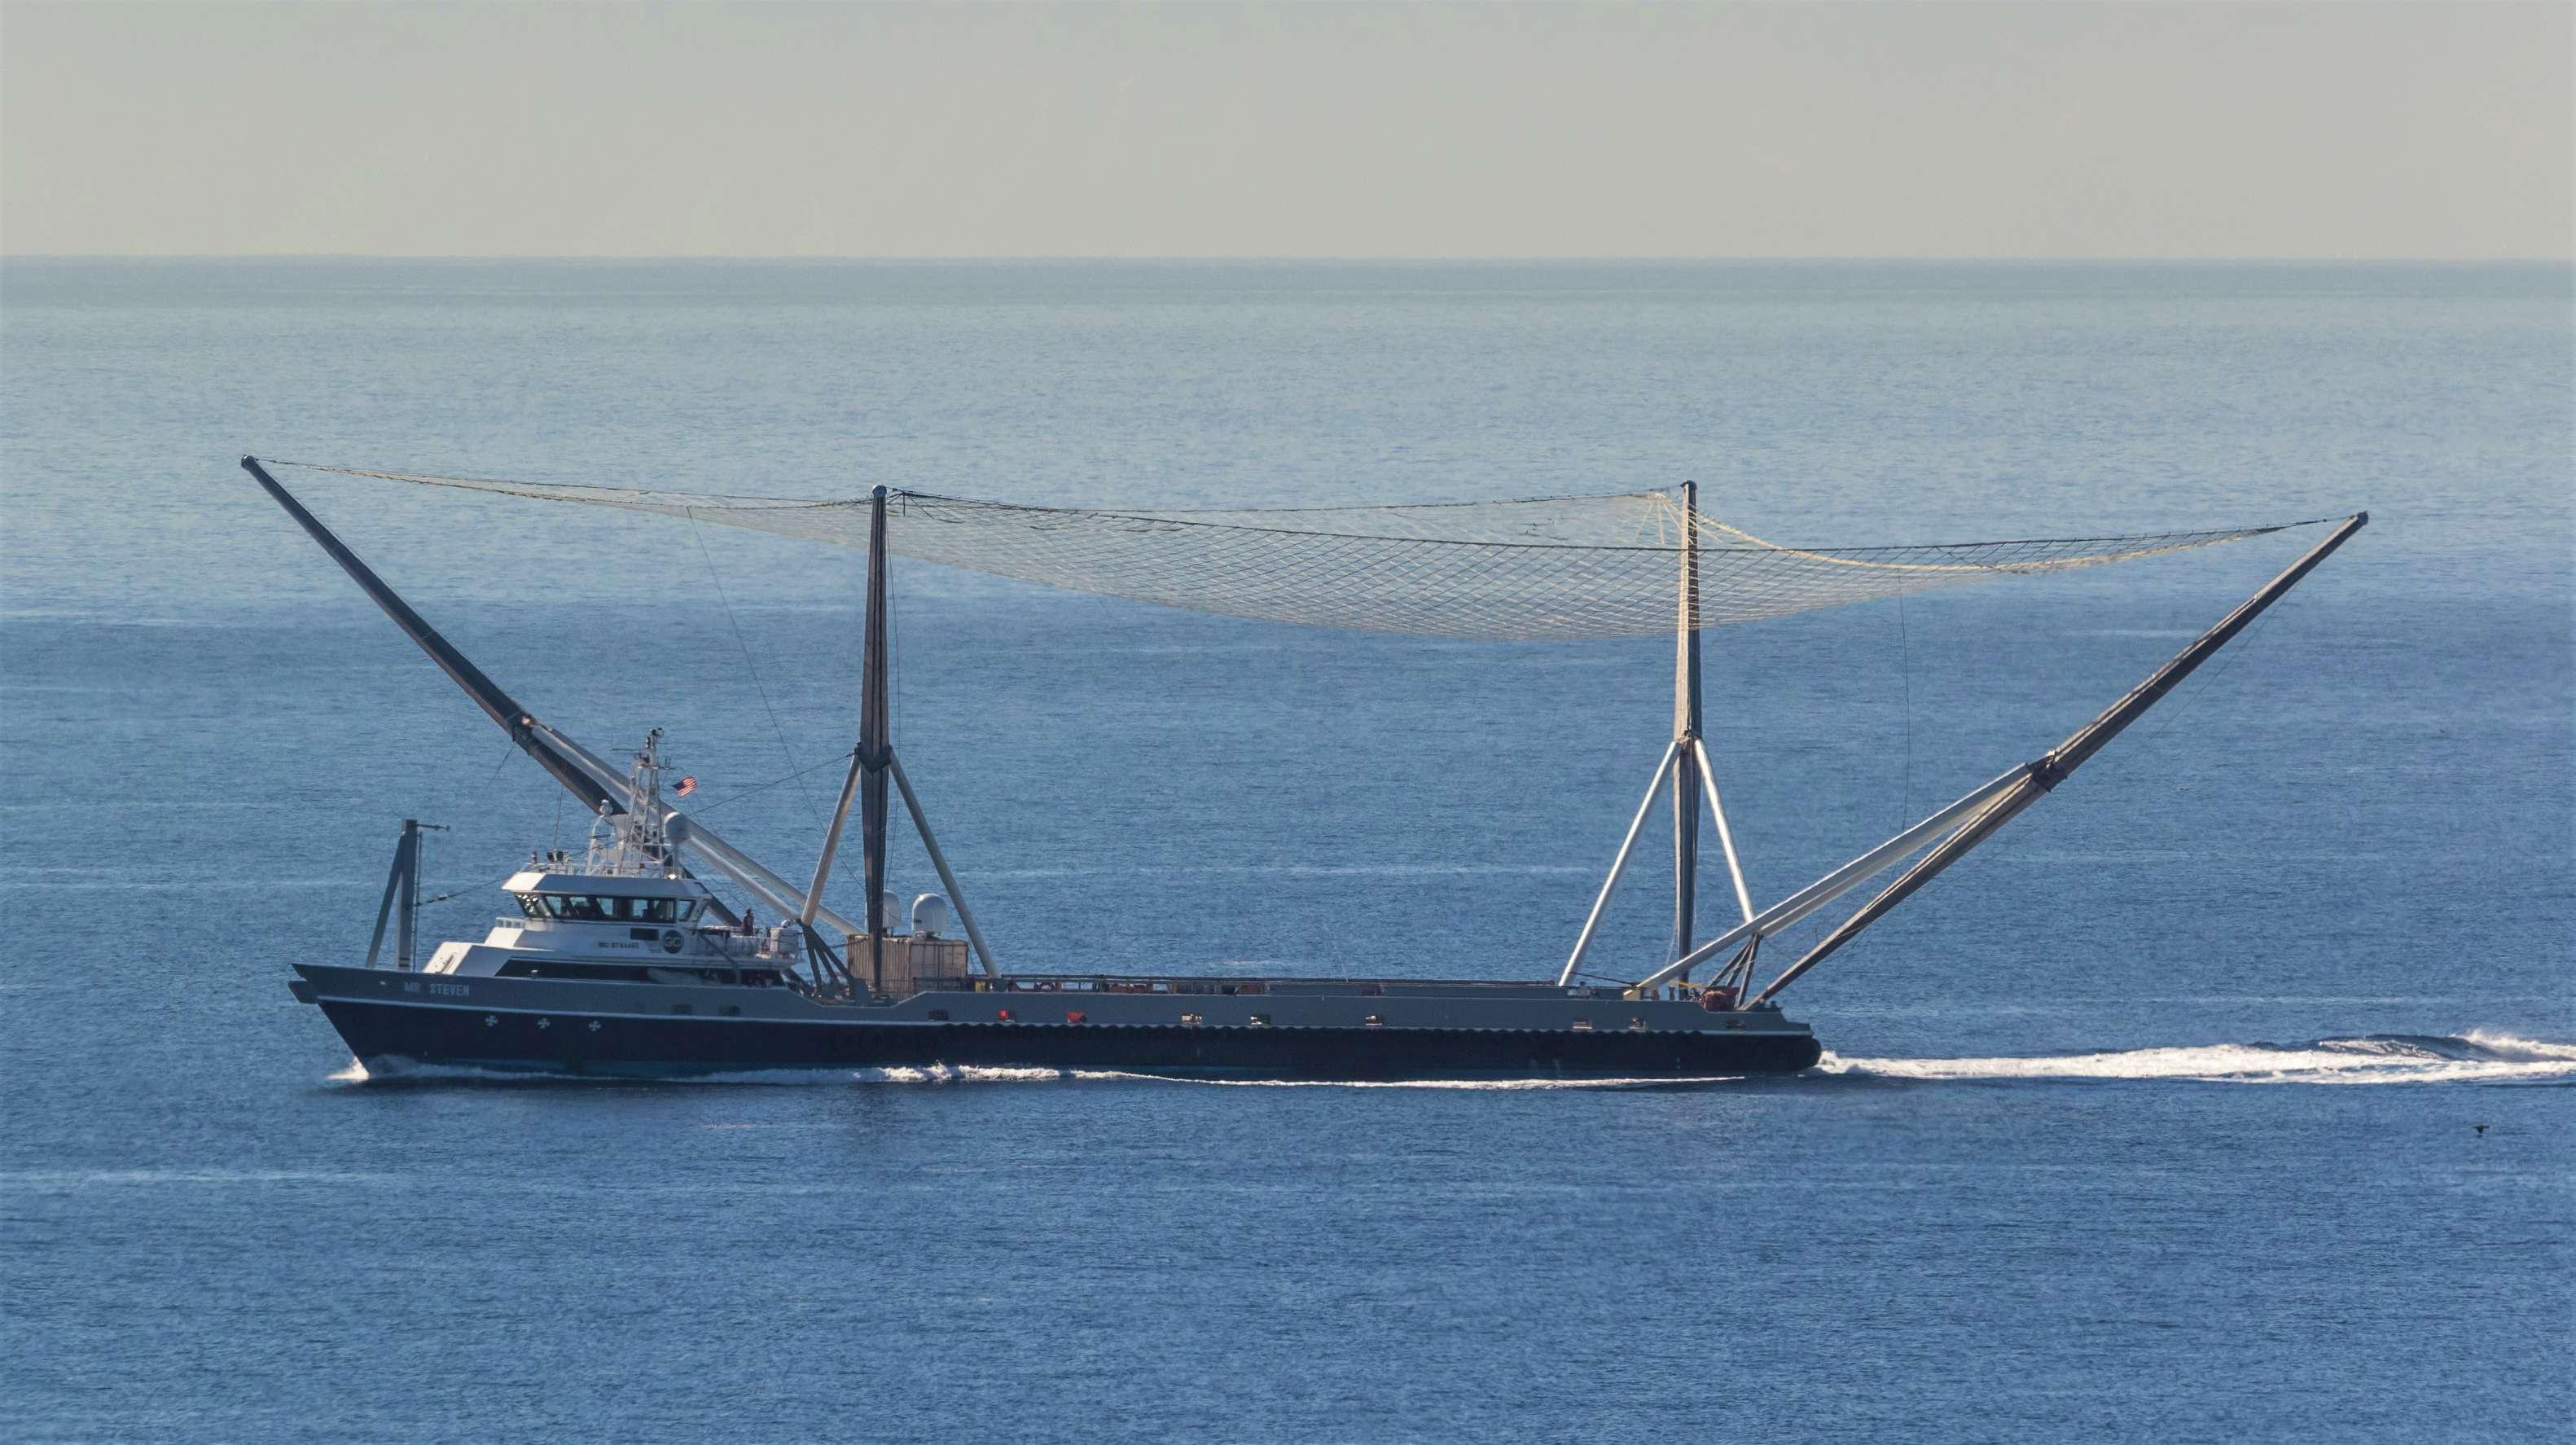 Mr Steven sea trials 111218 (Pauline Acalin) 8(c)